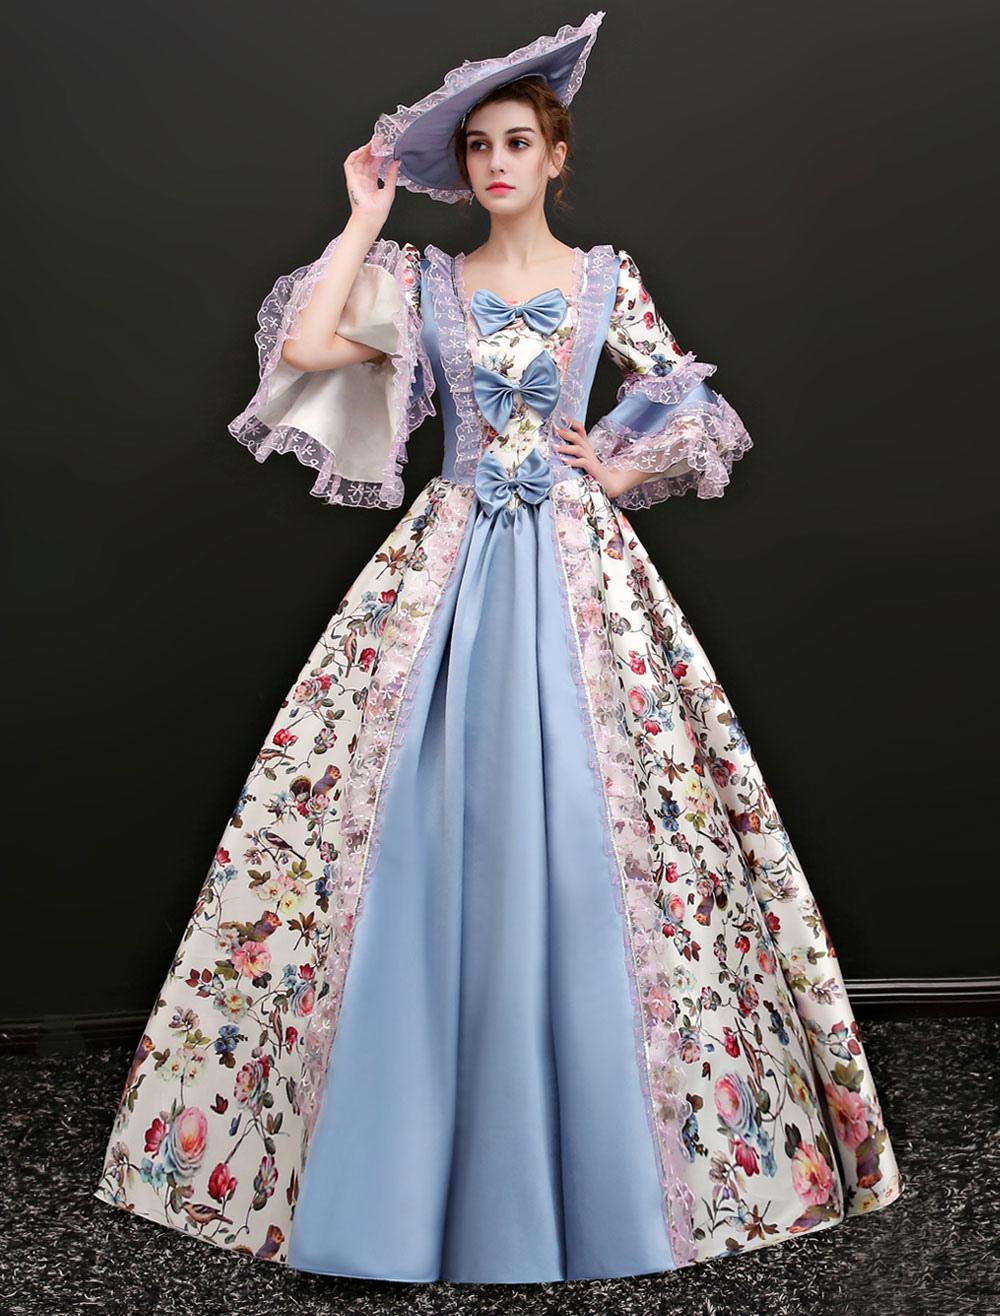 Rococo Vintage Costume Women's Illusion Blue Jacquard Long Dresses